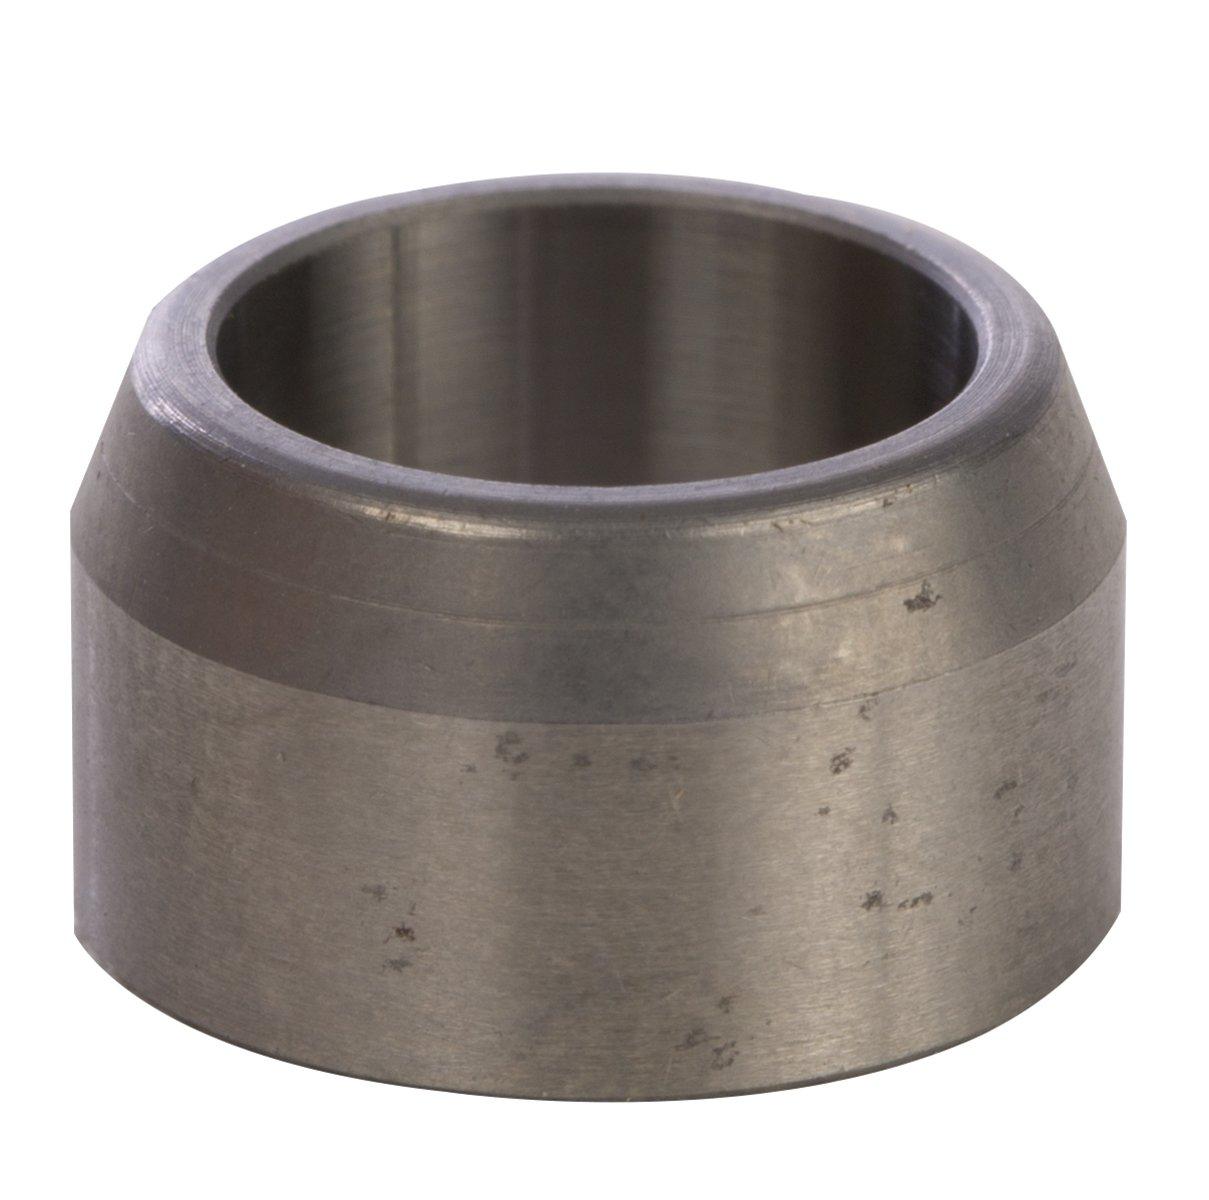 Cobalt High Speed Steel 75 mm Flute Length Pack of 10 Bronze Coating Dormer A7777.6 NAS907J Jobber Drill 7.6 mm Head Diameter